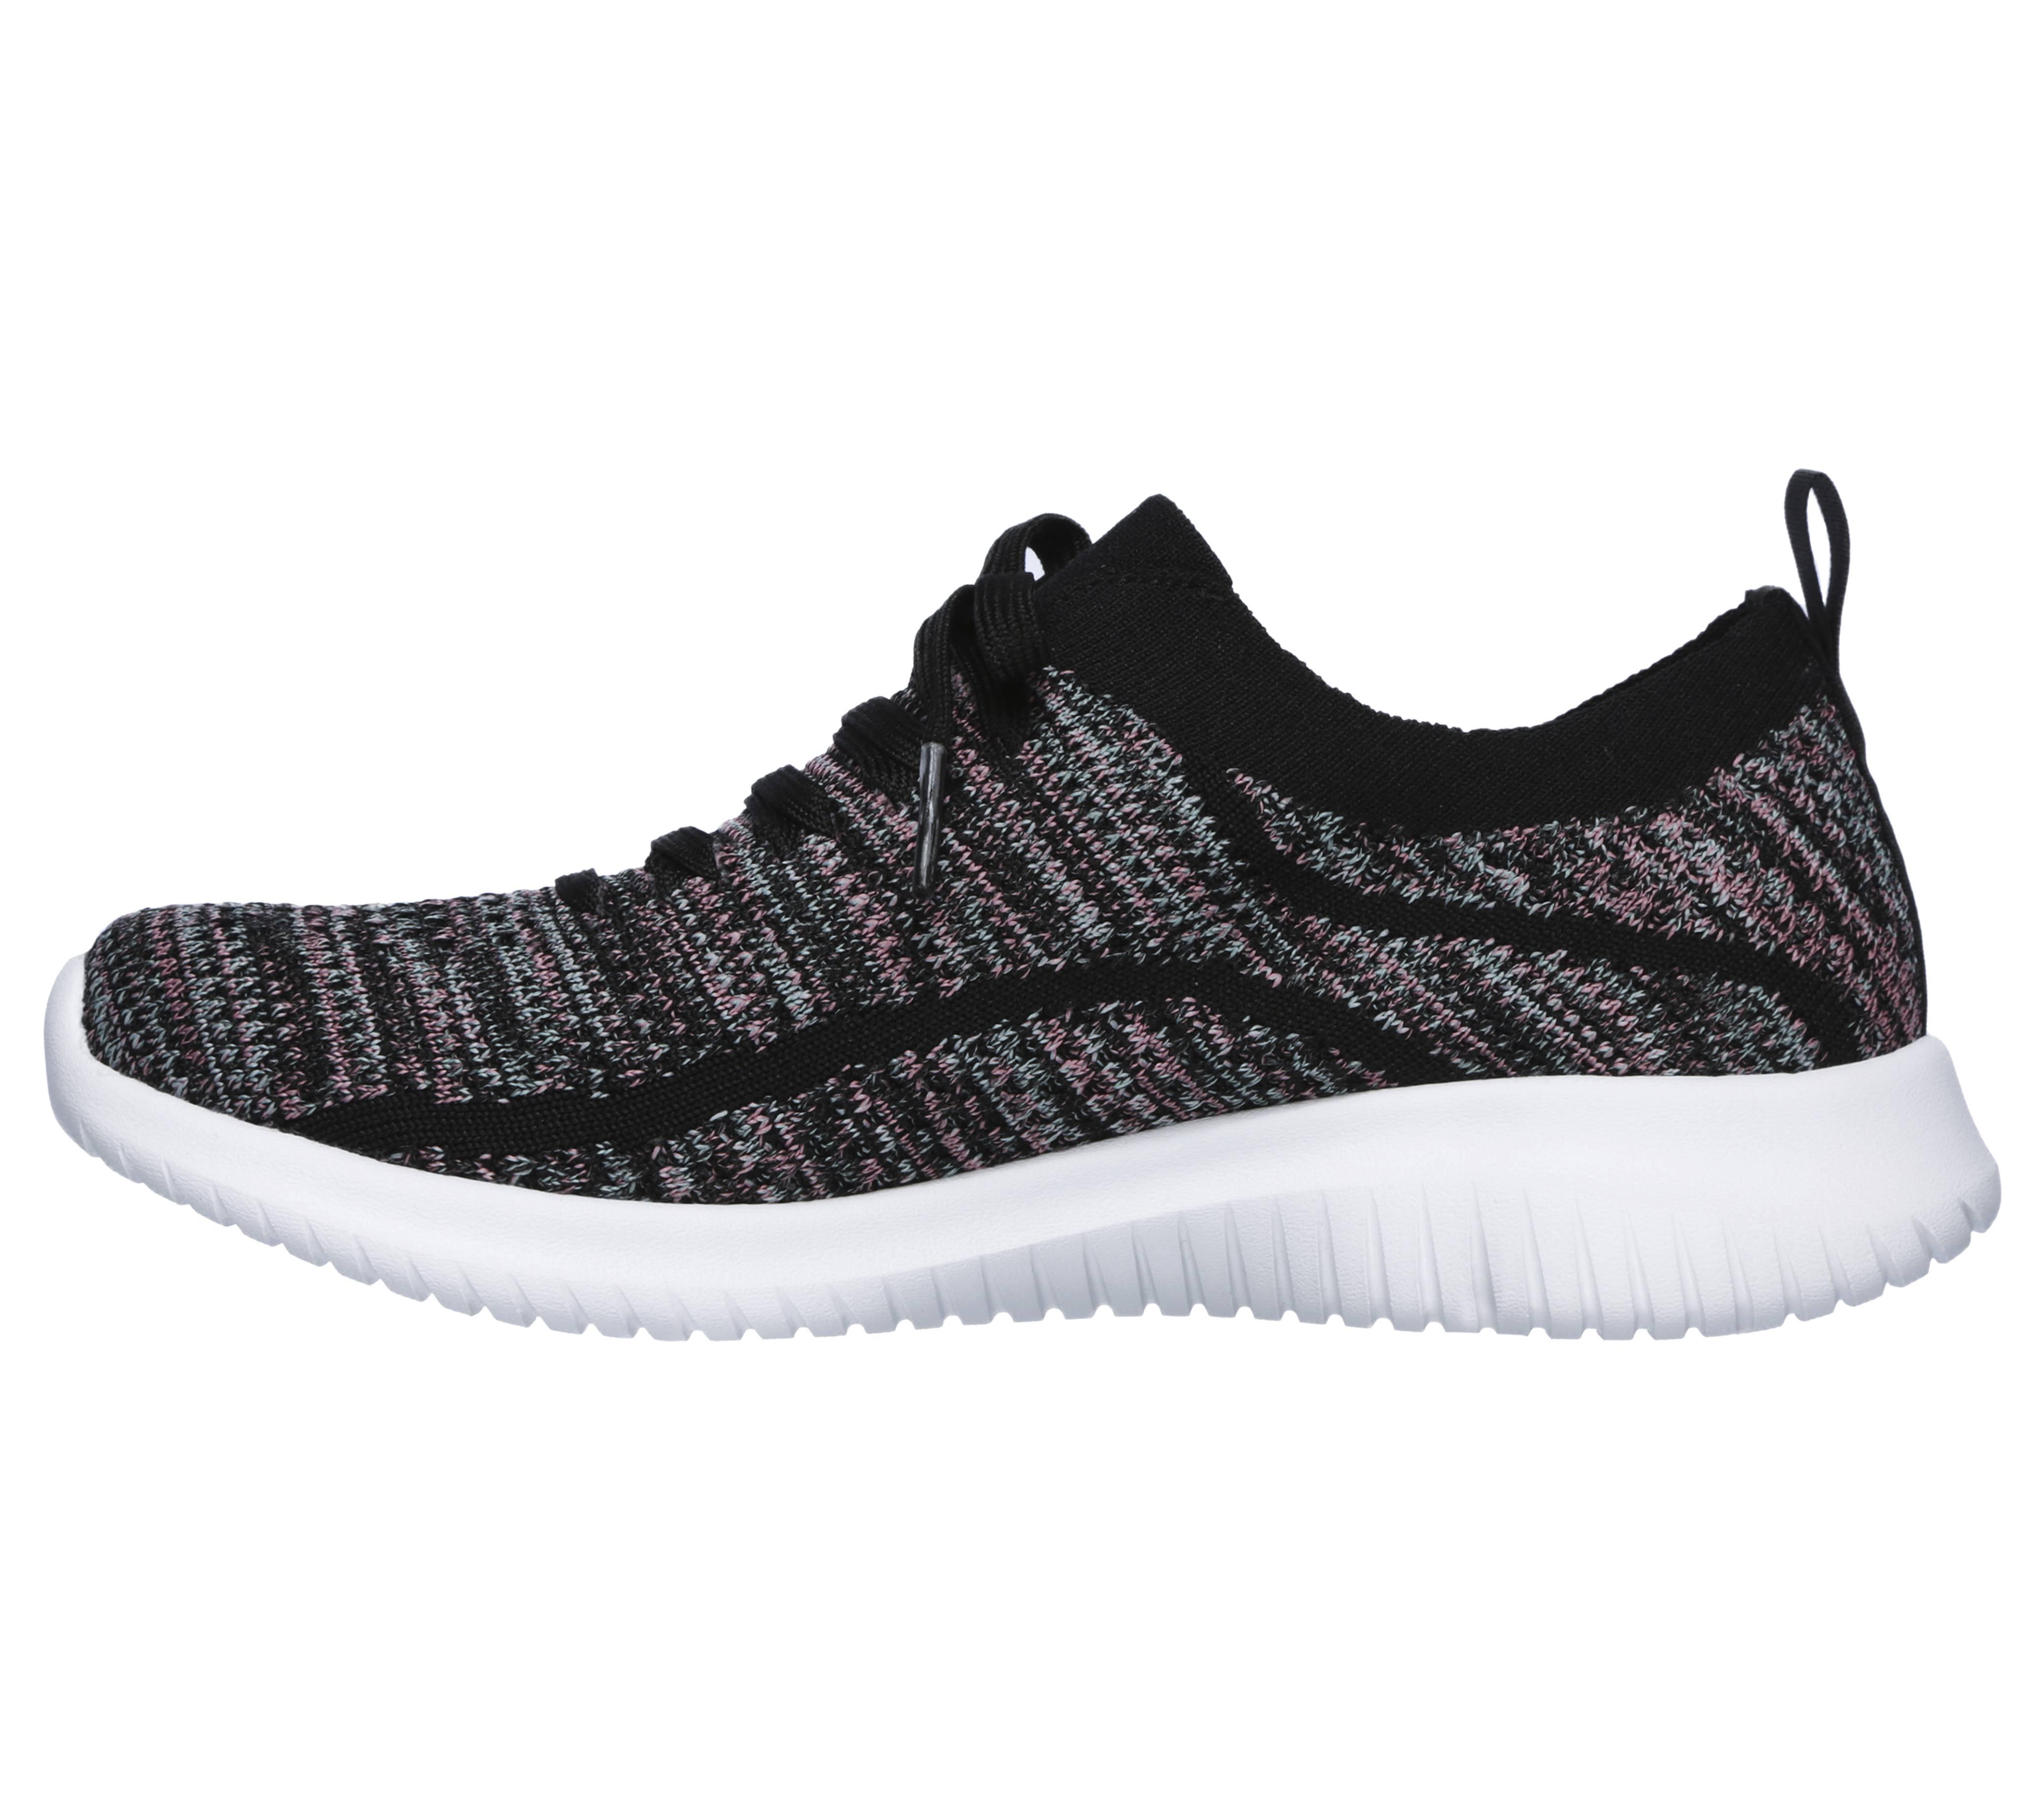 Details about Women Skechers ULTRA FLEX STATEMENTS 12841 BKMT BLACKMulti Lace Up Walking Shoes